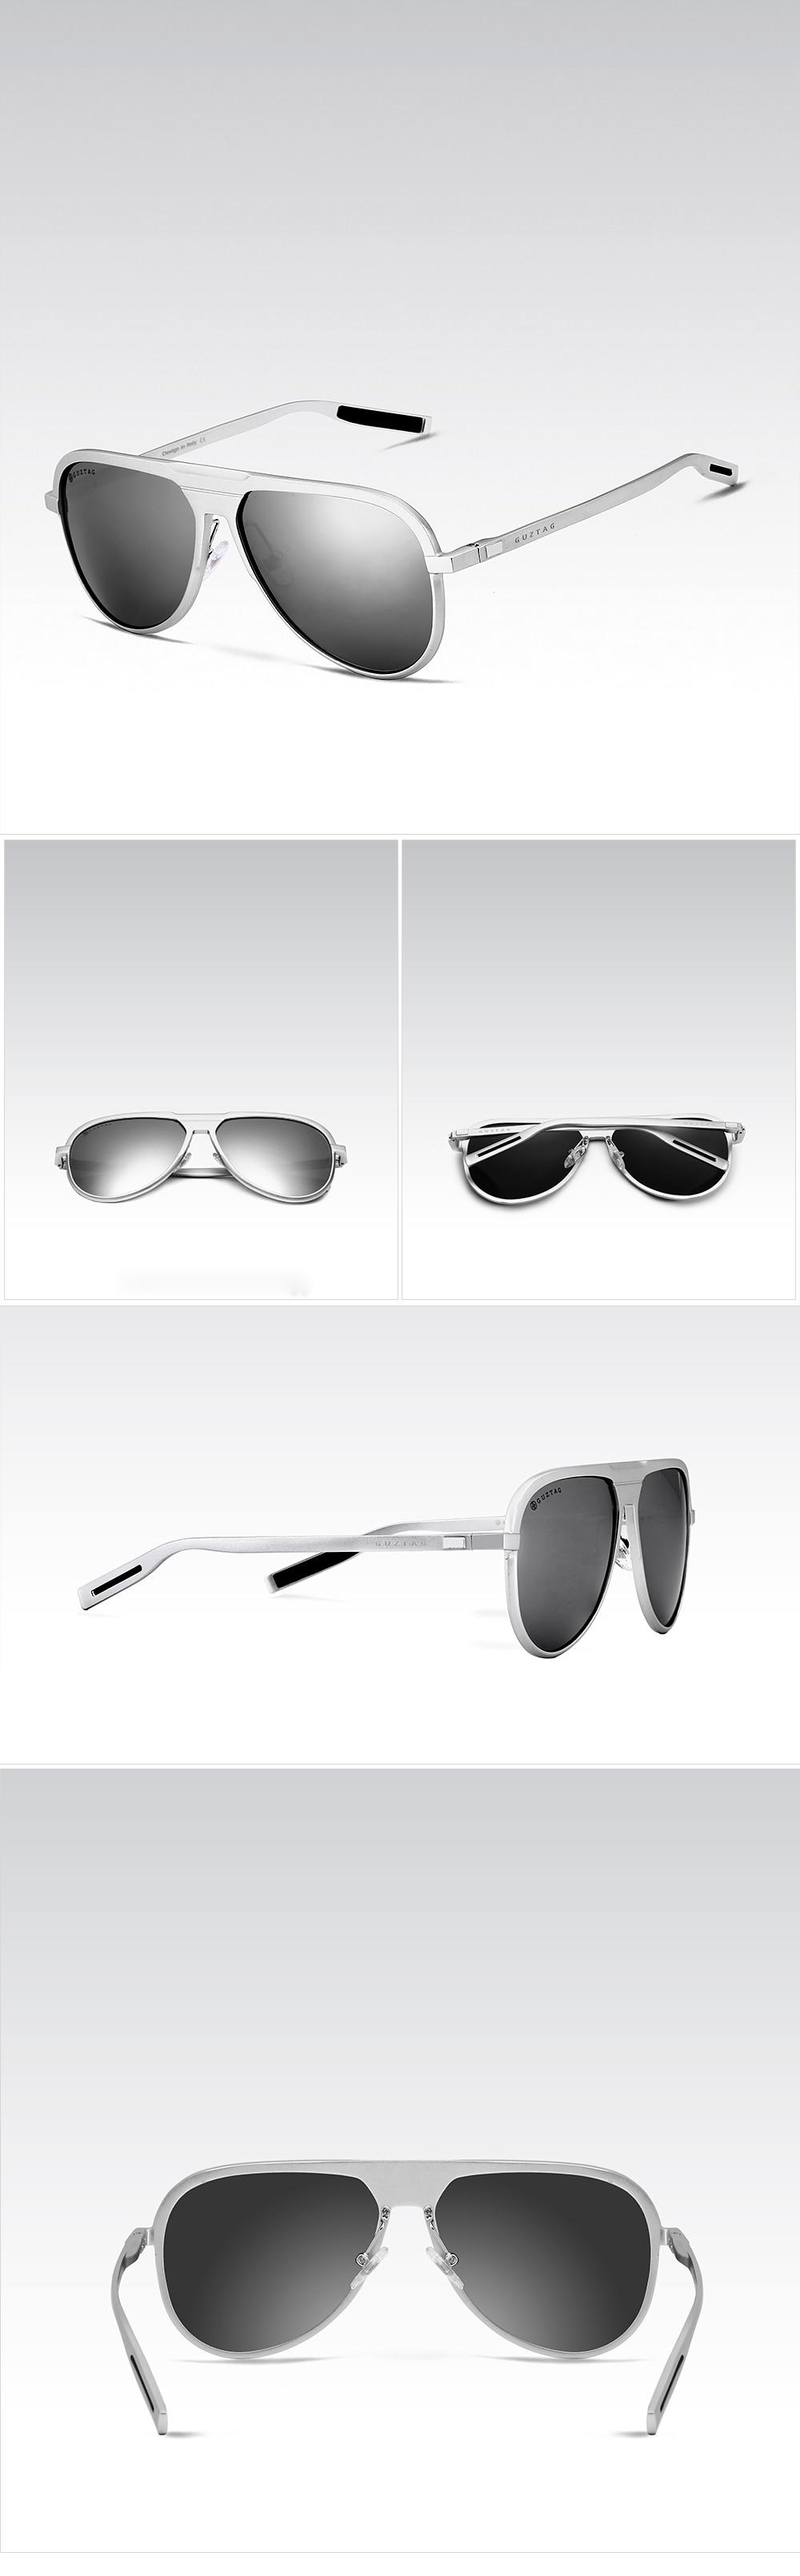 f31e521a11 GUZTAG Unisex Classic Brand Men Aluminum Sunglasses HD Polarized ...